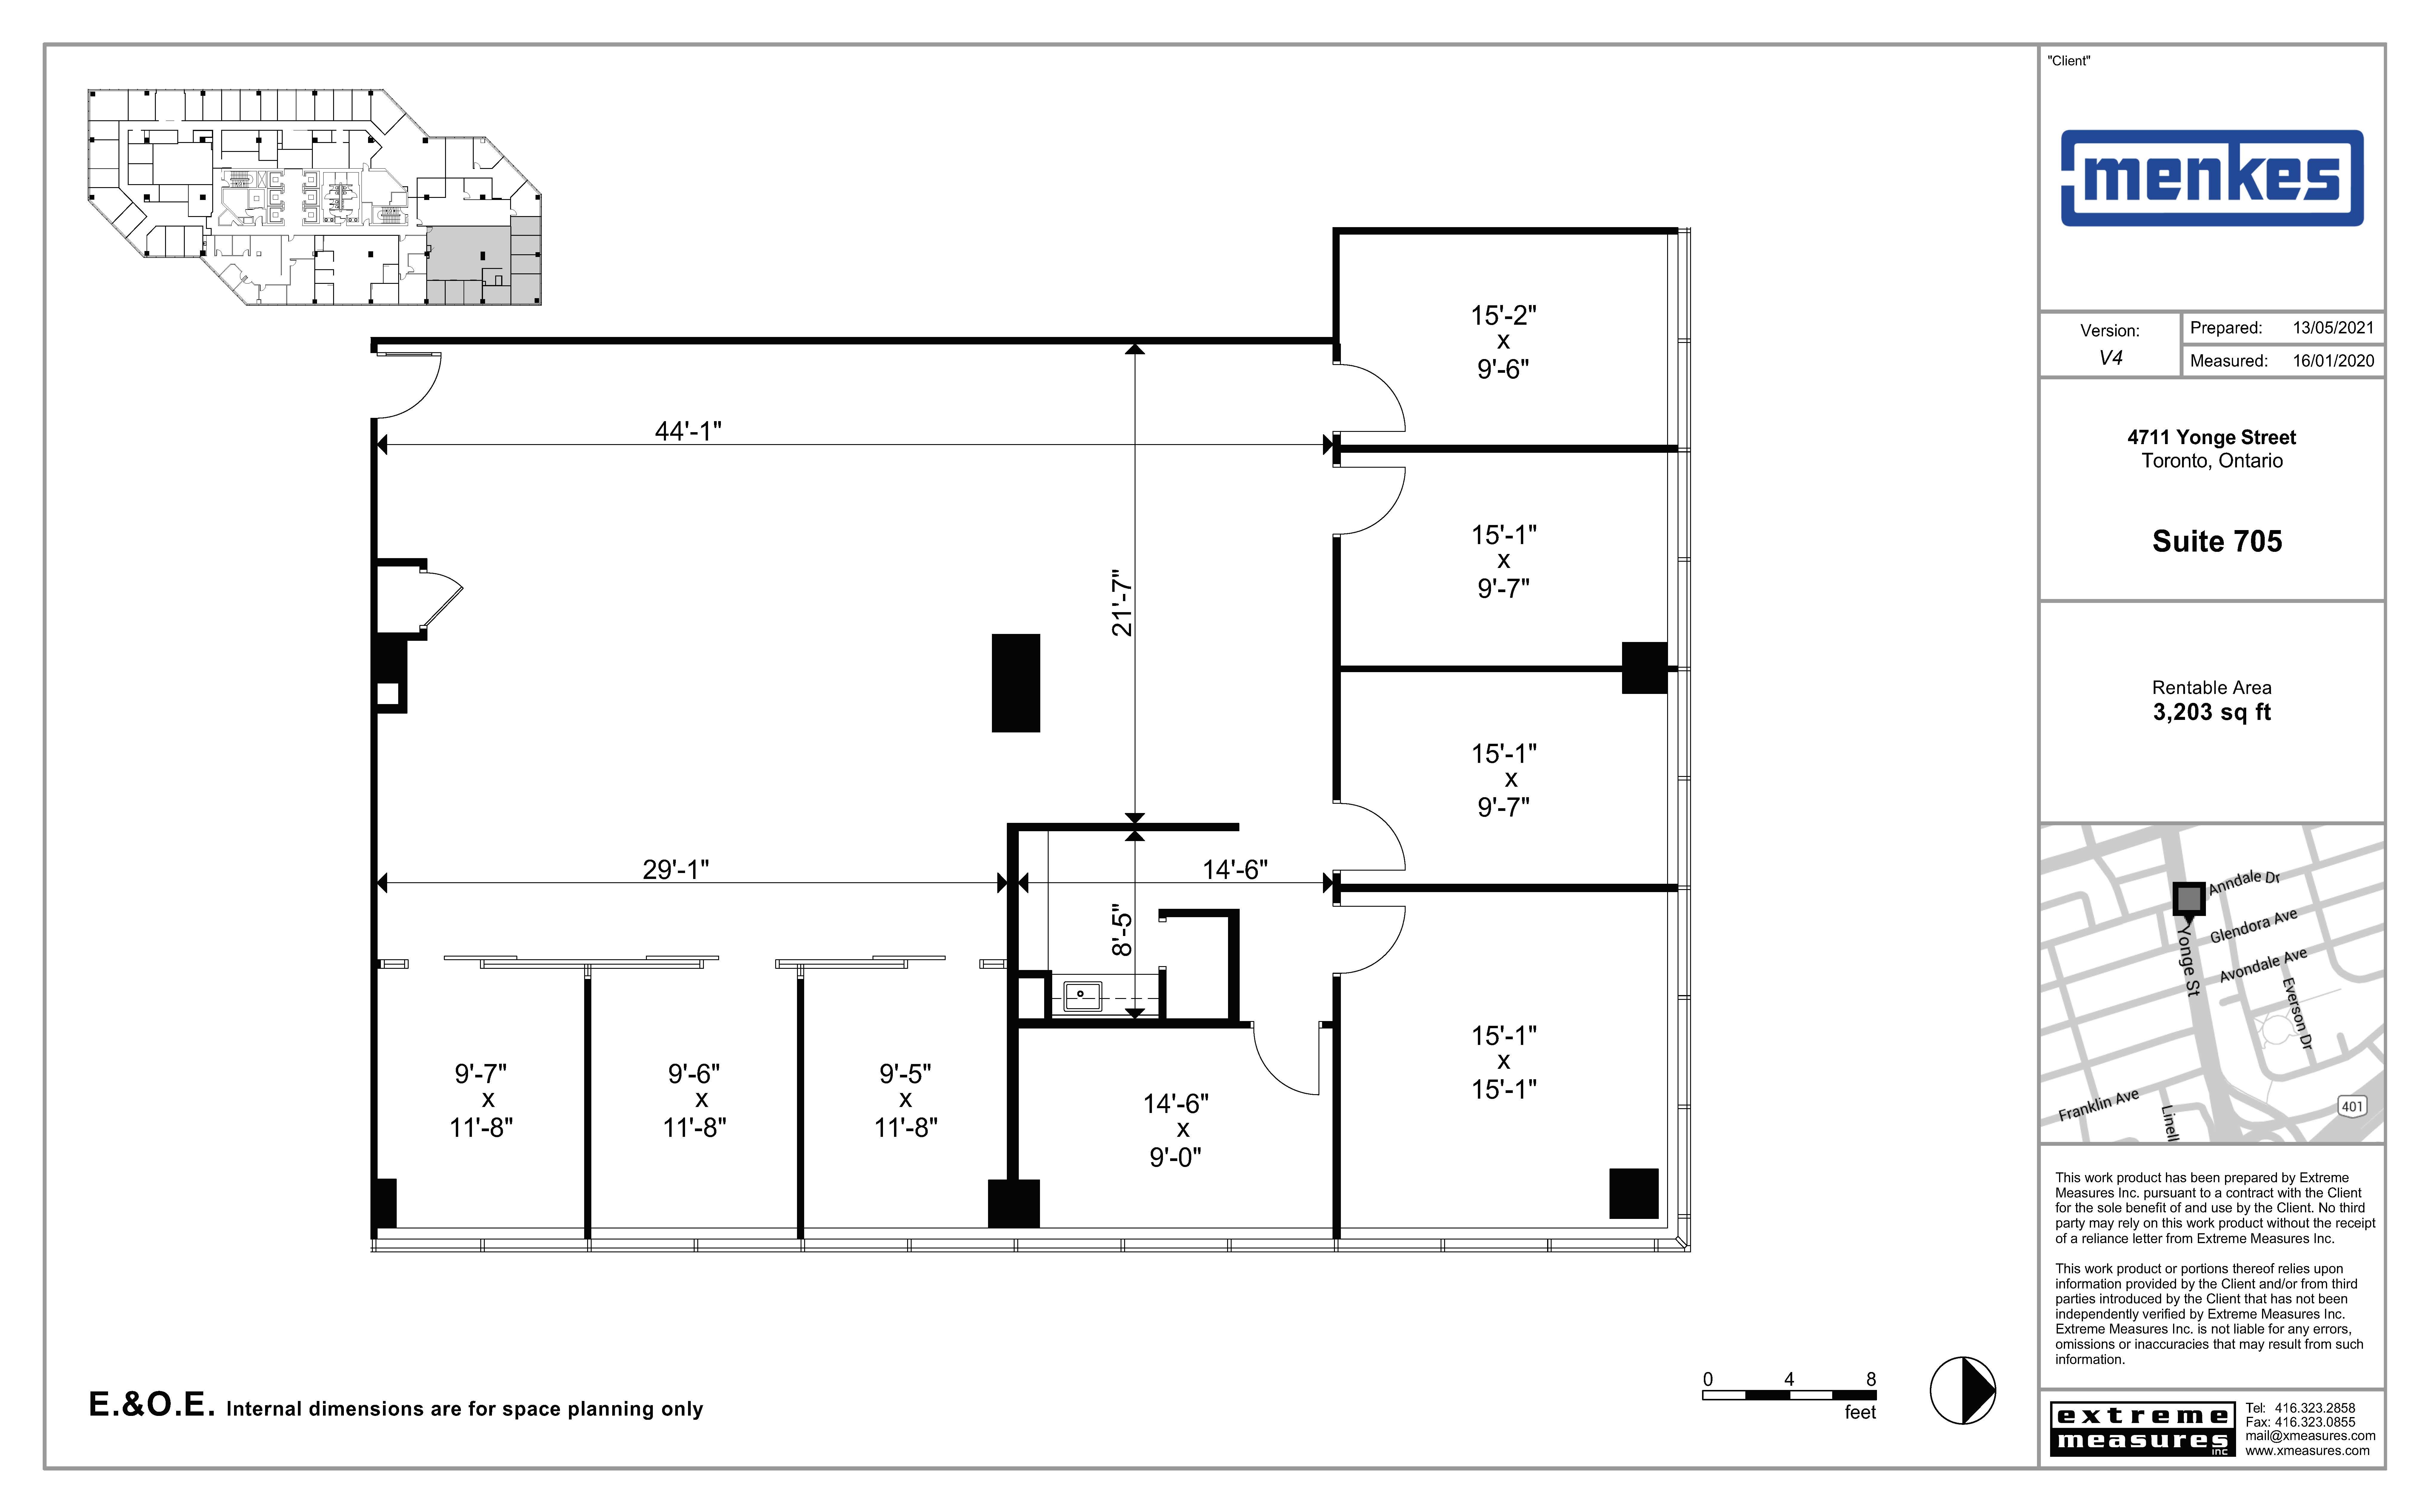 Floorplan thumbnail of suite 705